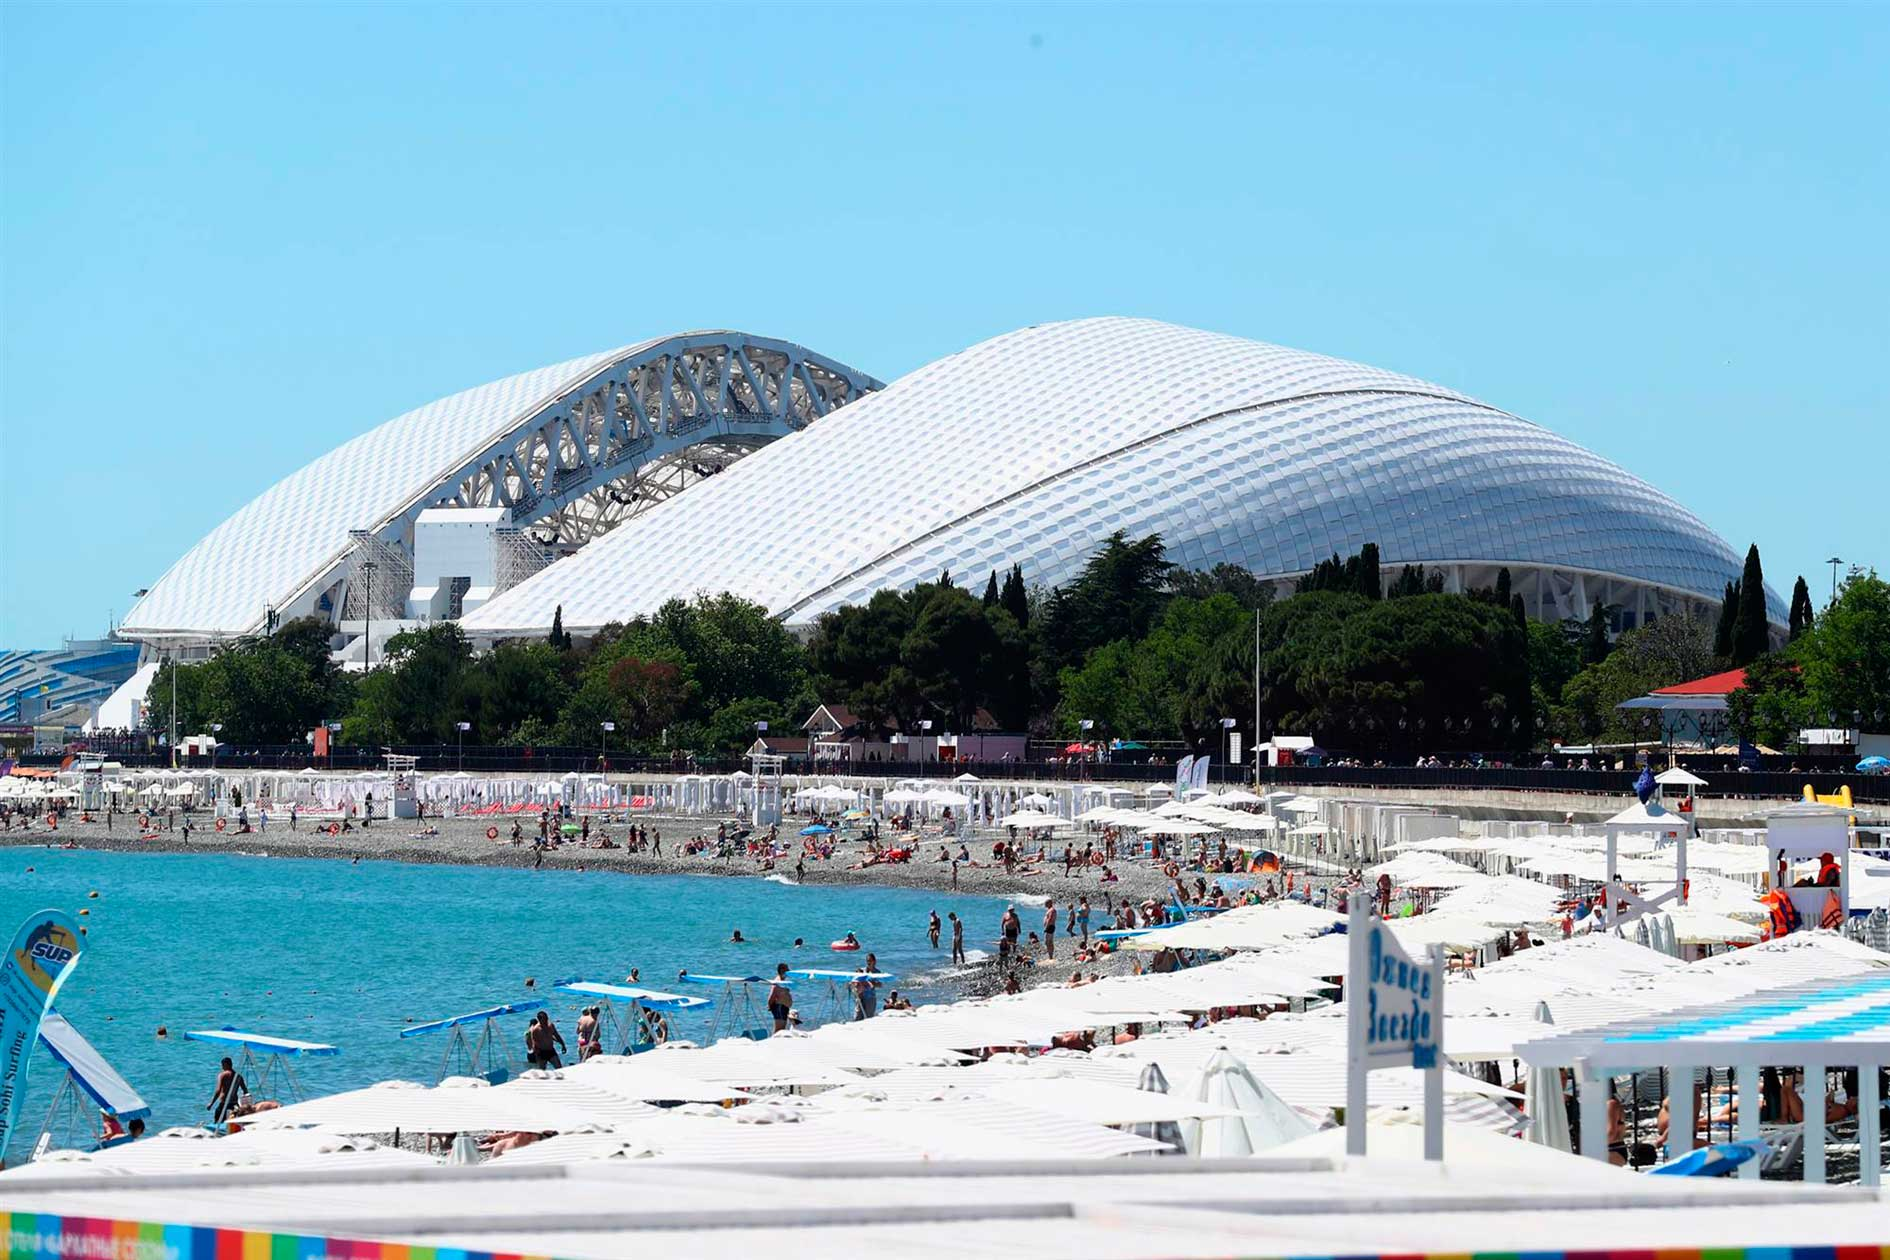 Olímpico de Sochi Exterior